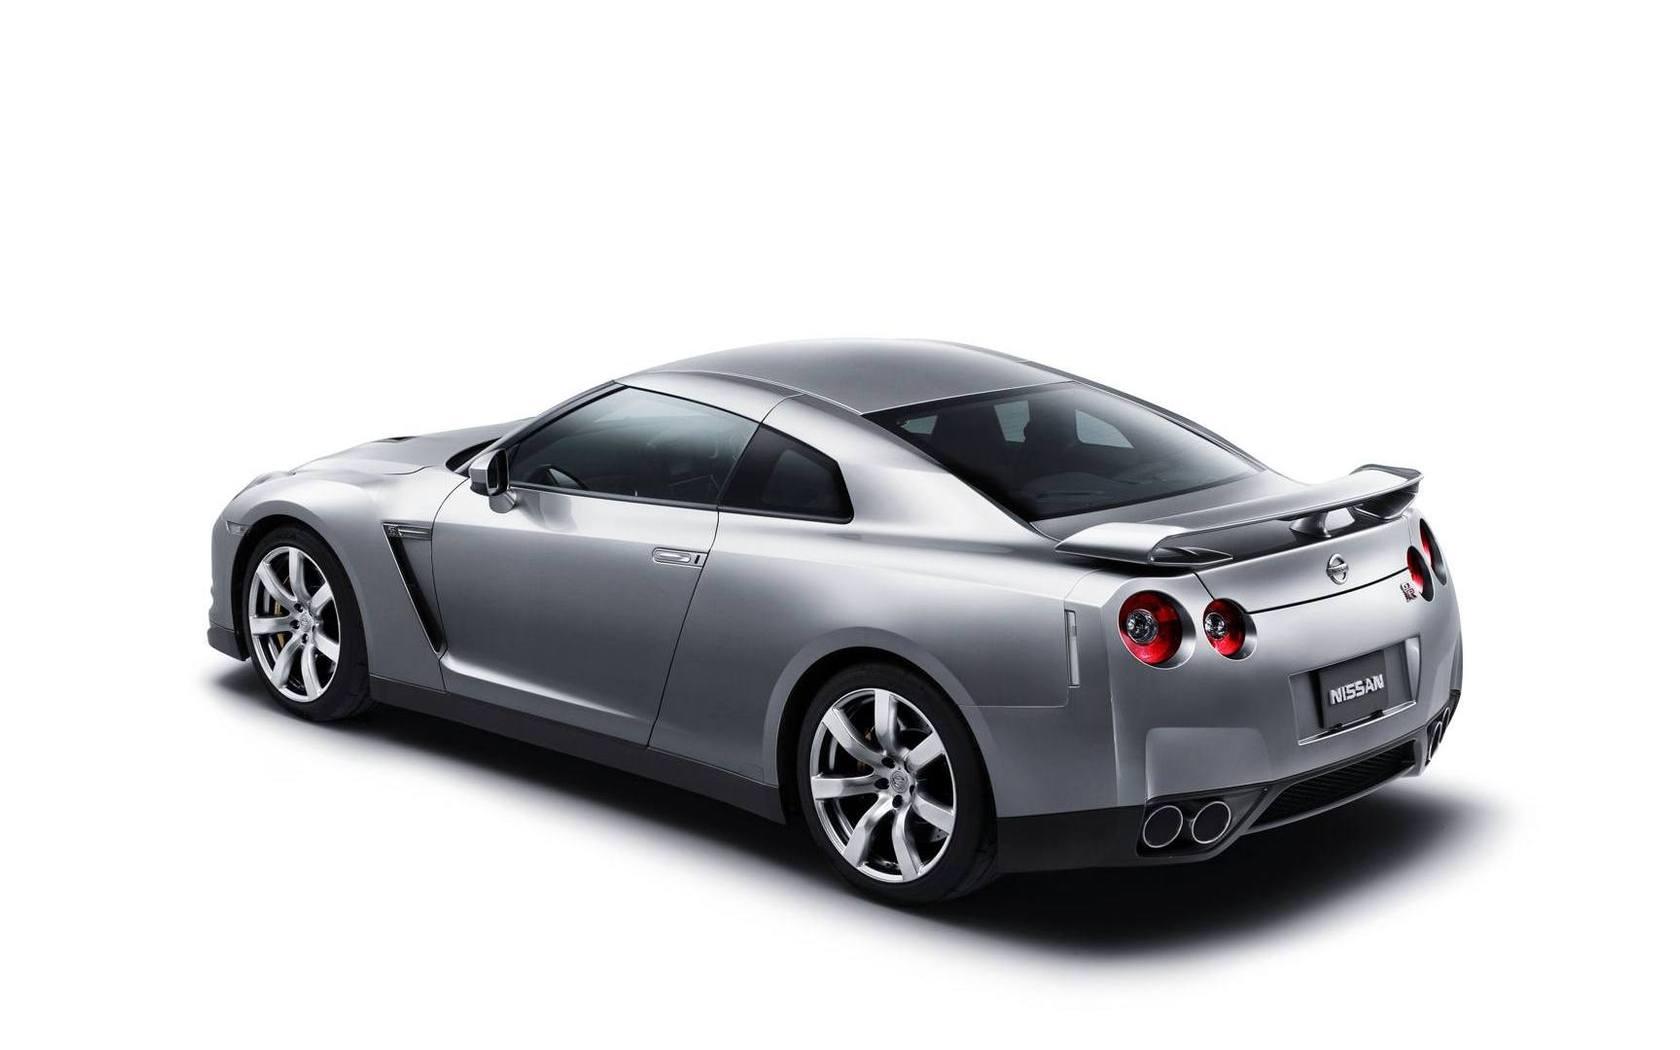 Nissan GT R wallpaper 37561 1680x1050